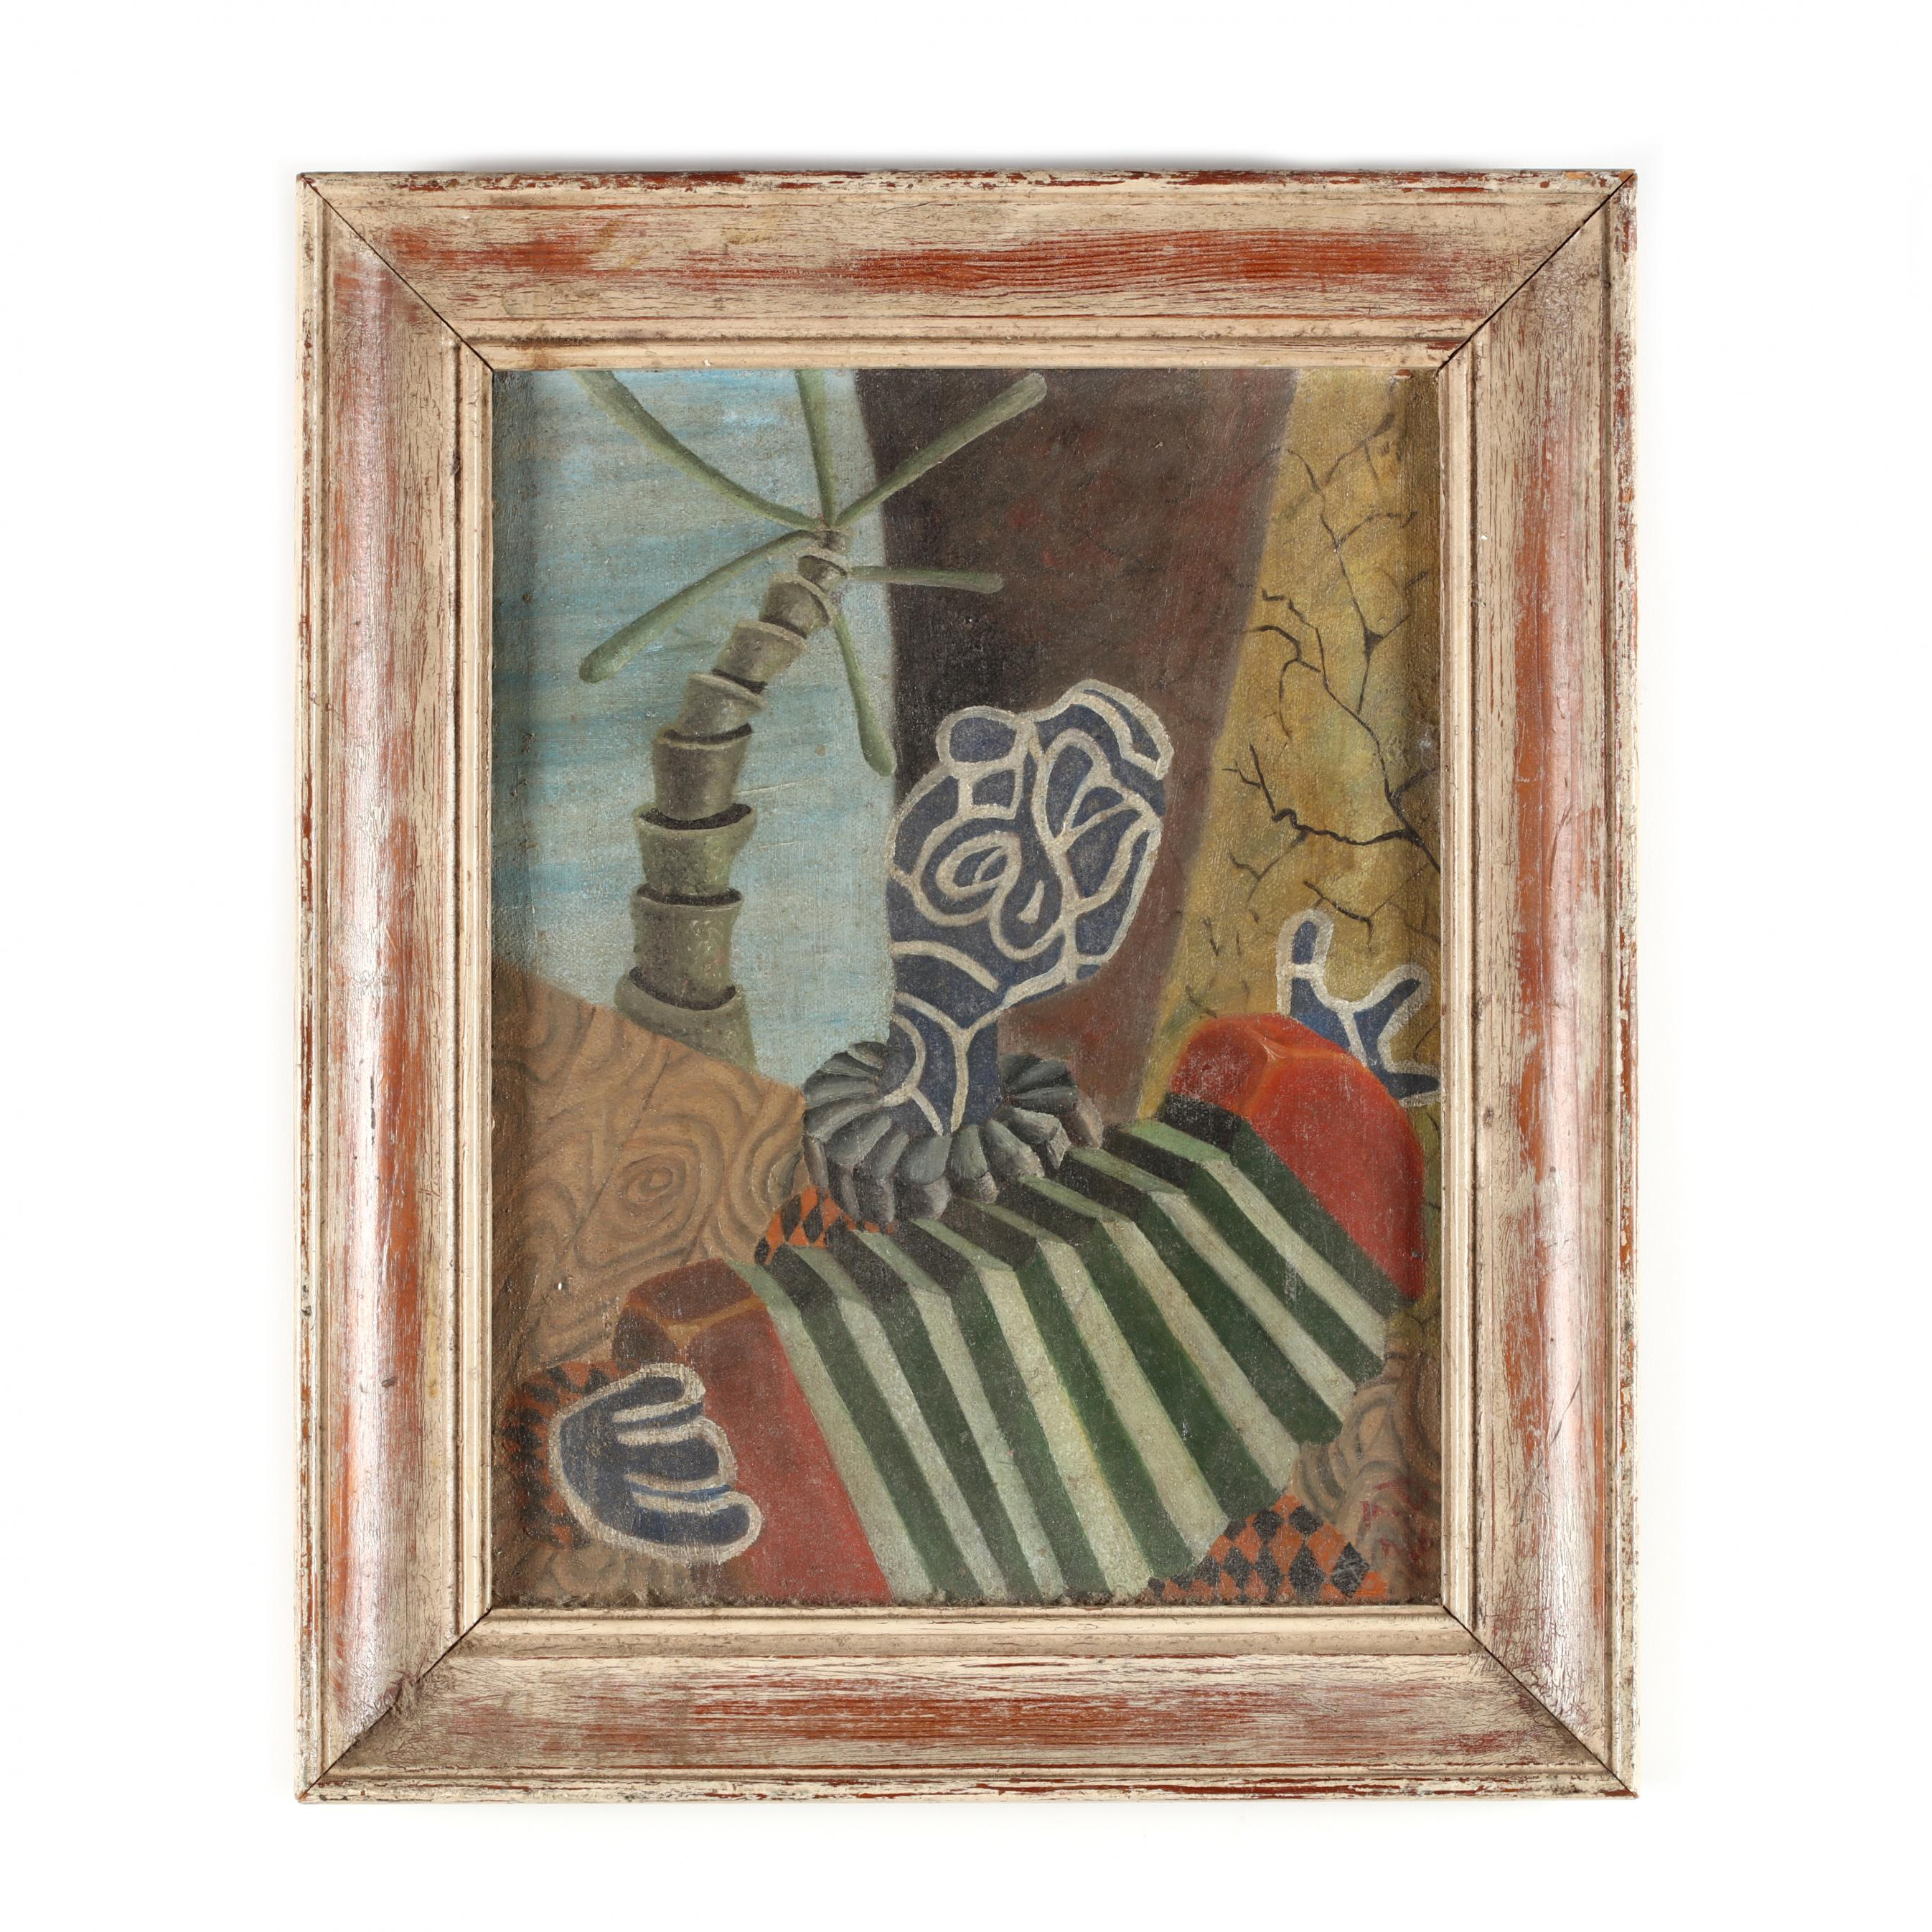 arthur-danto-ny-mi-1924-2013-clown-with-accordion